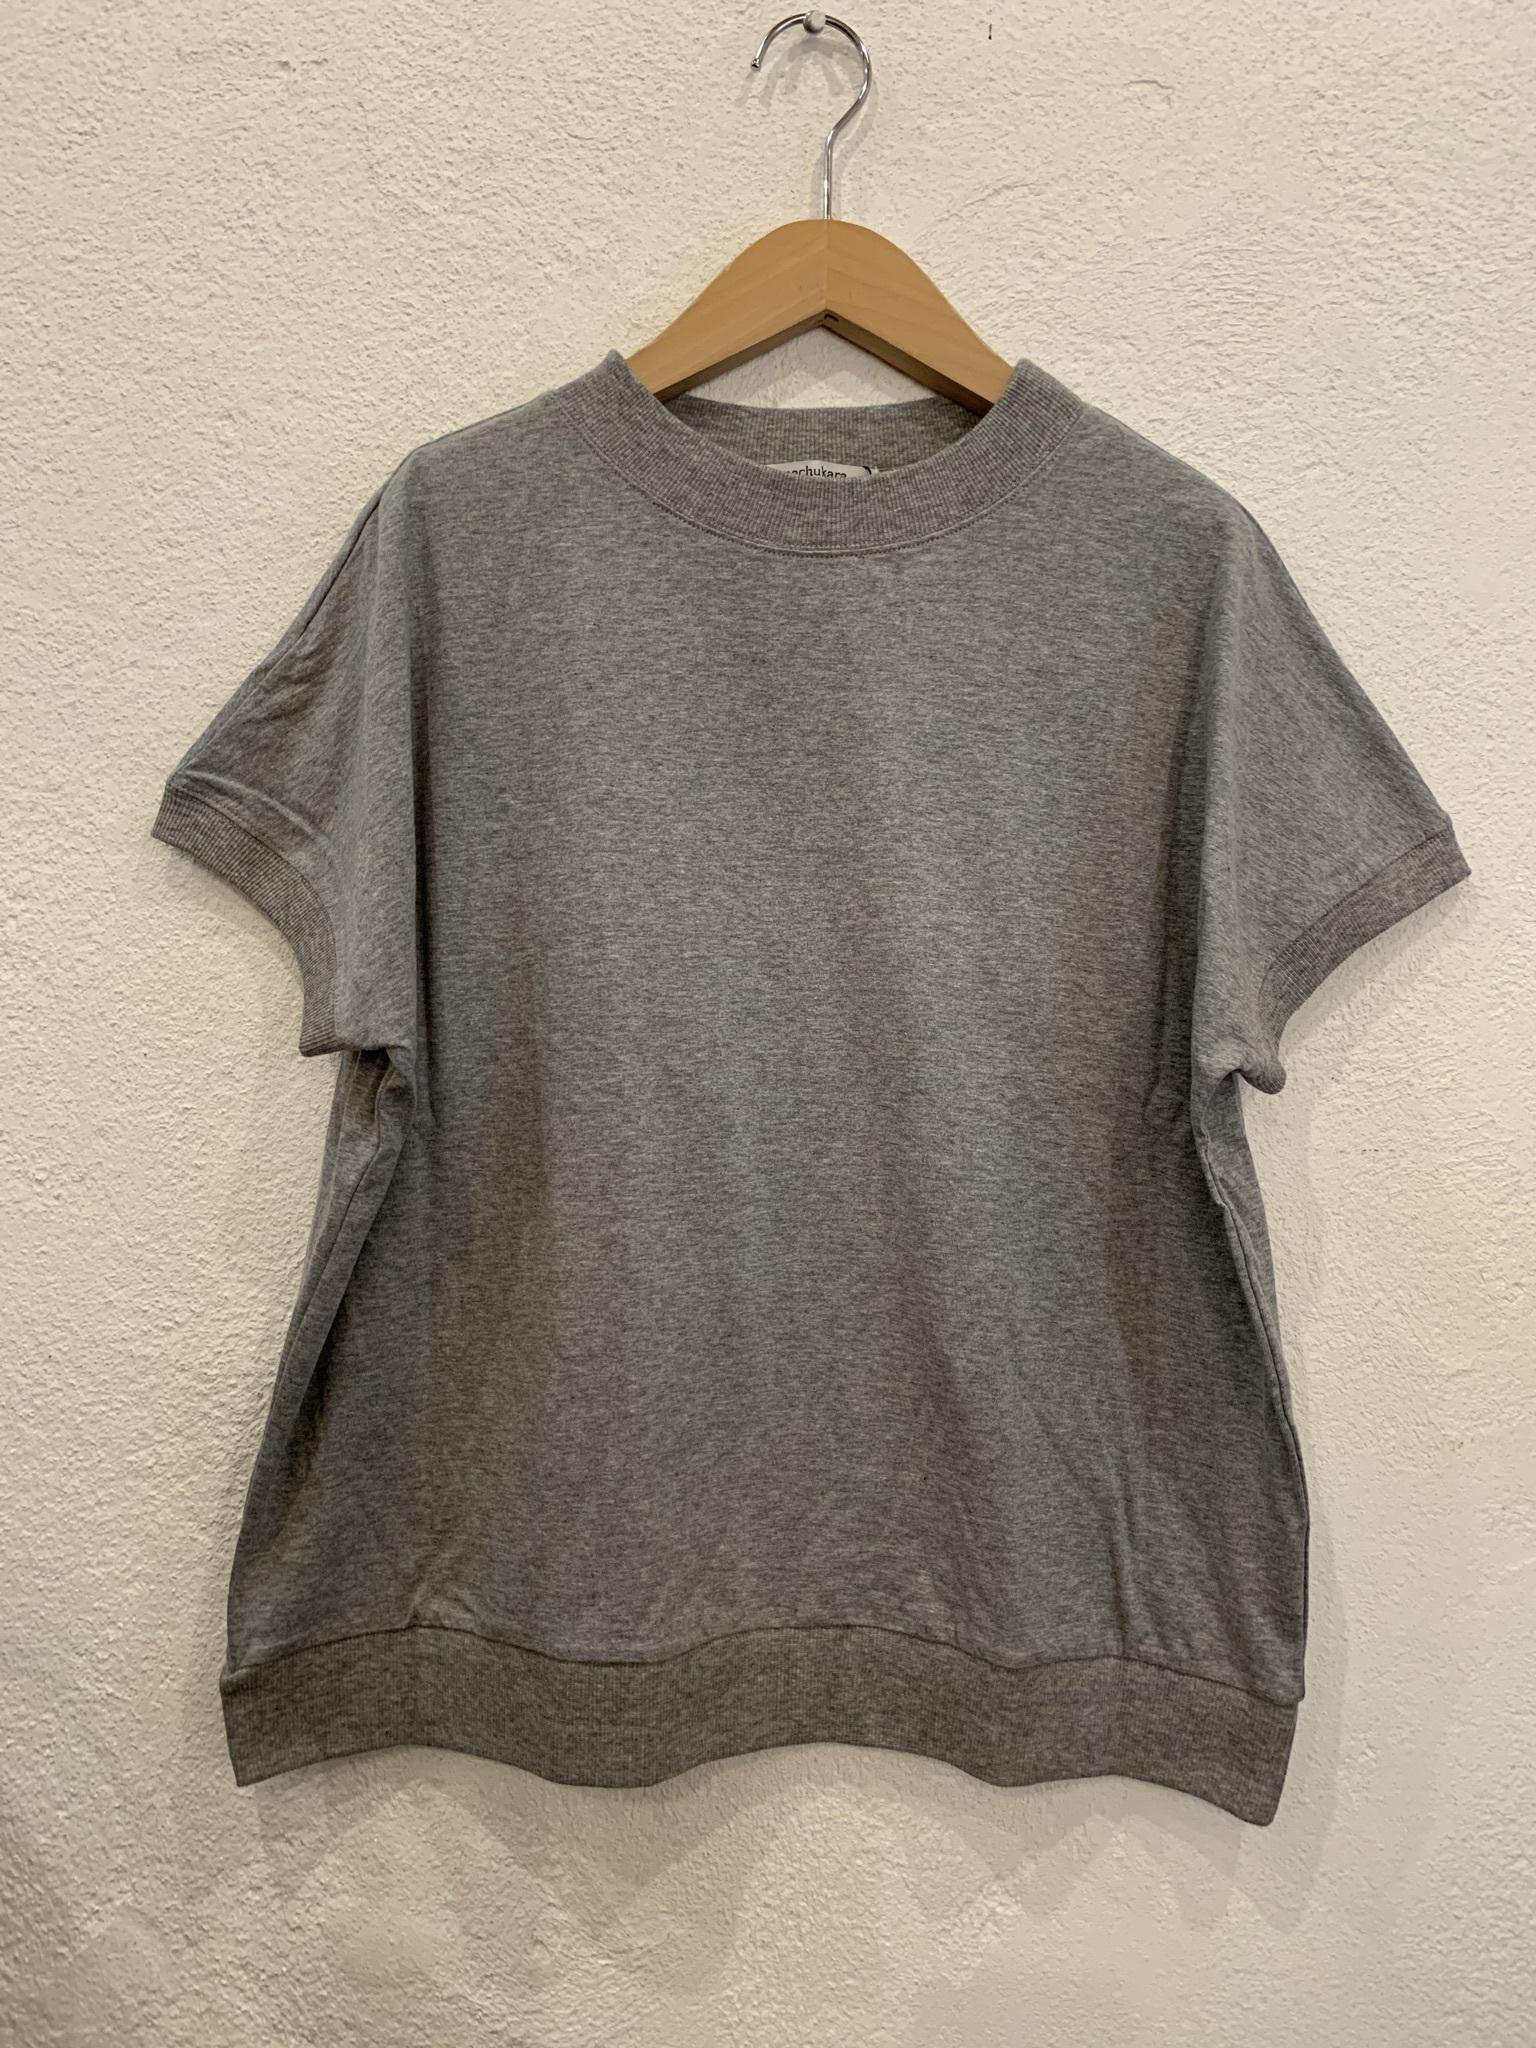 nachukara/リブドッキング半袖Tシャツ グレー